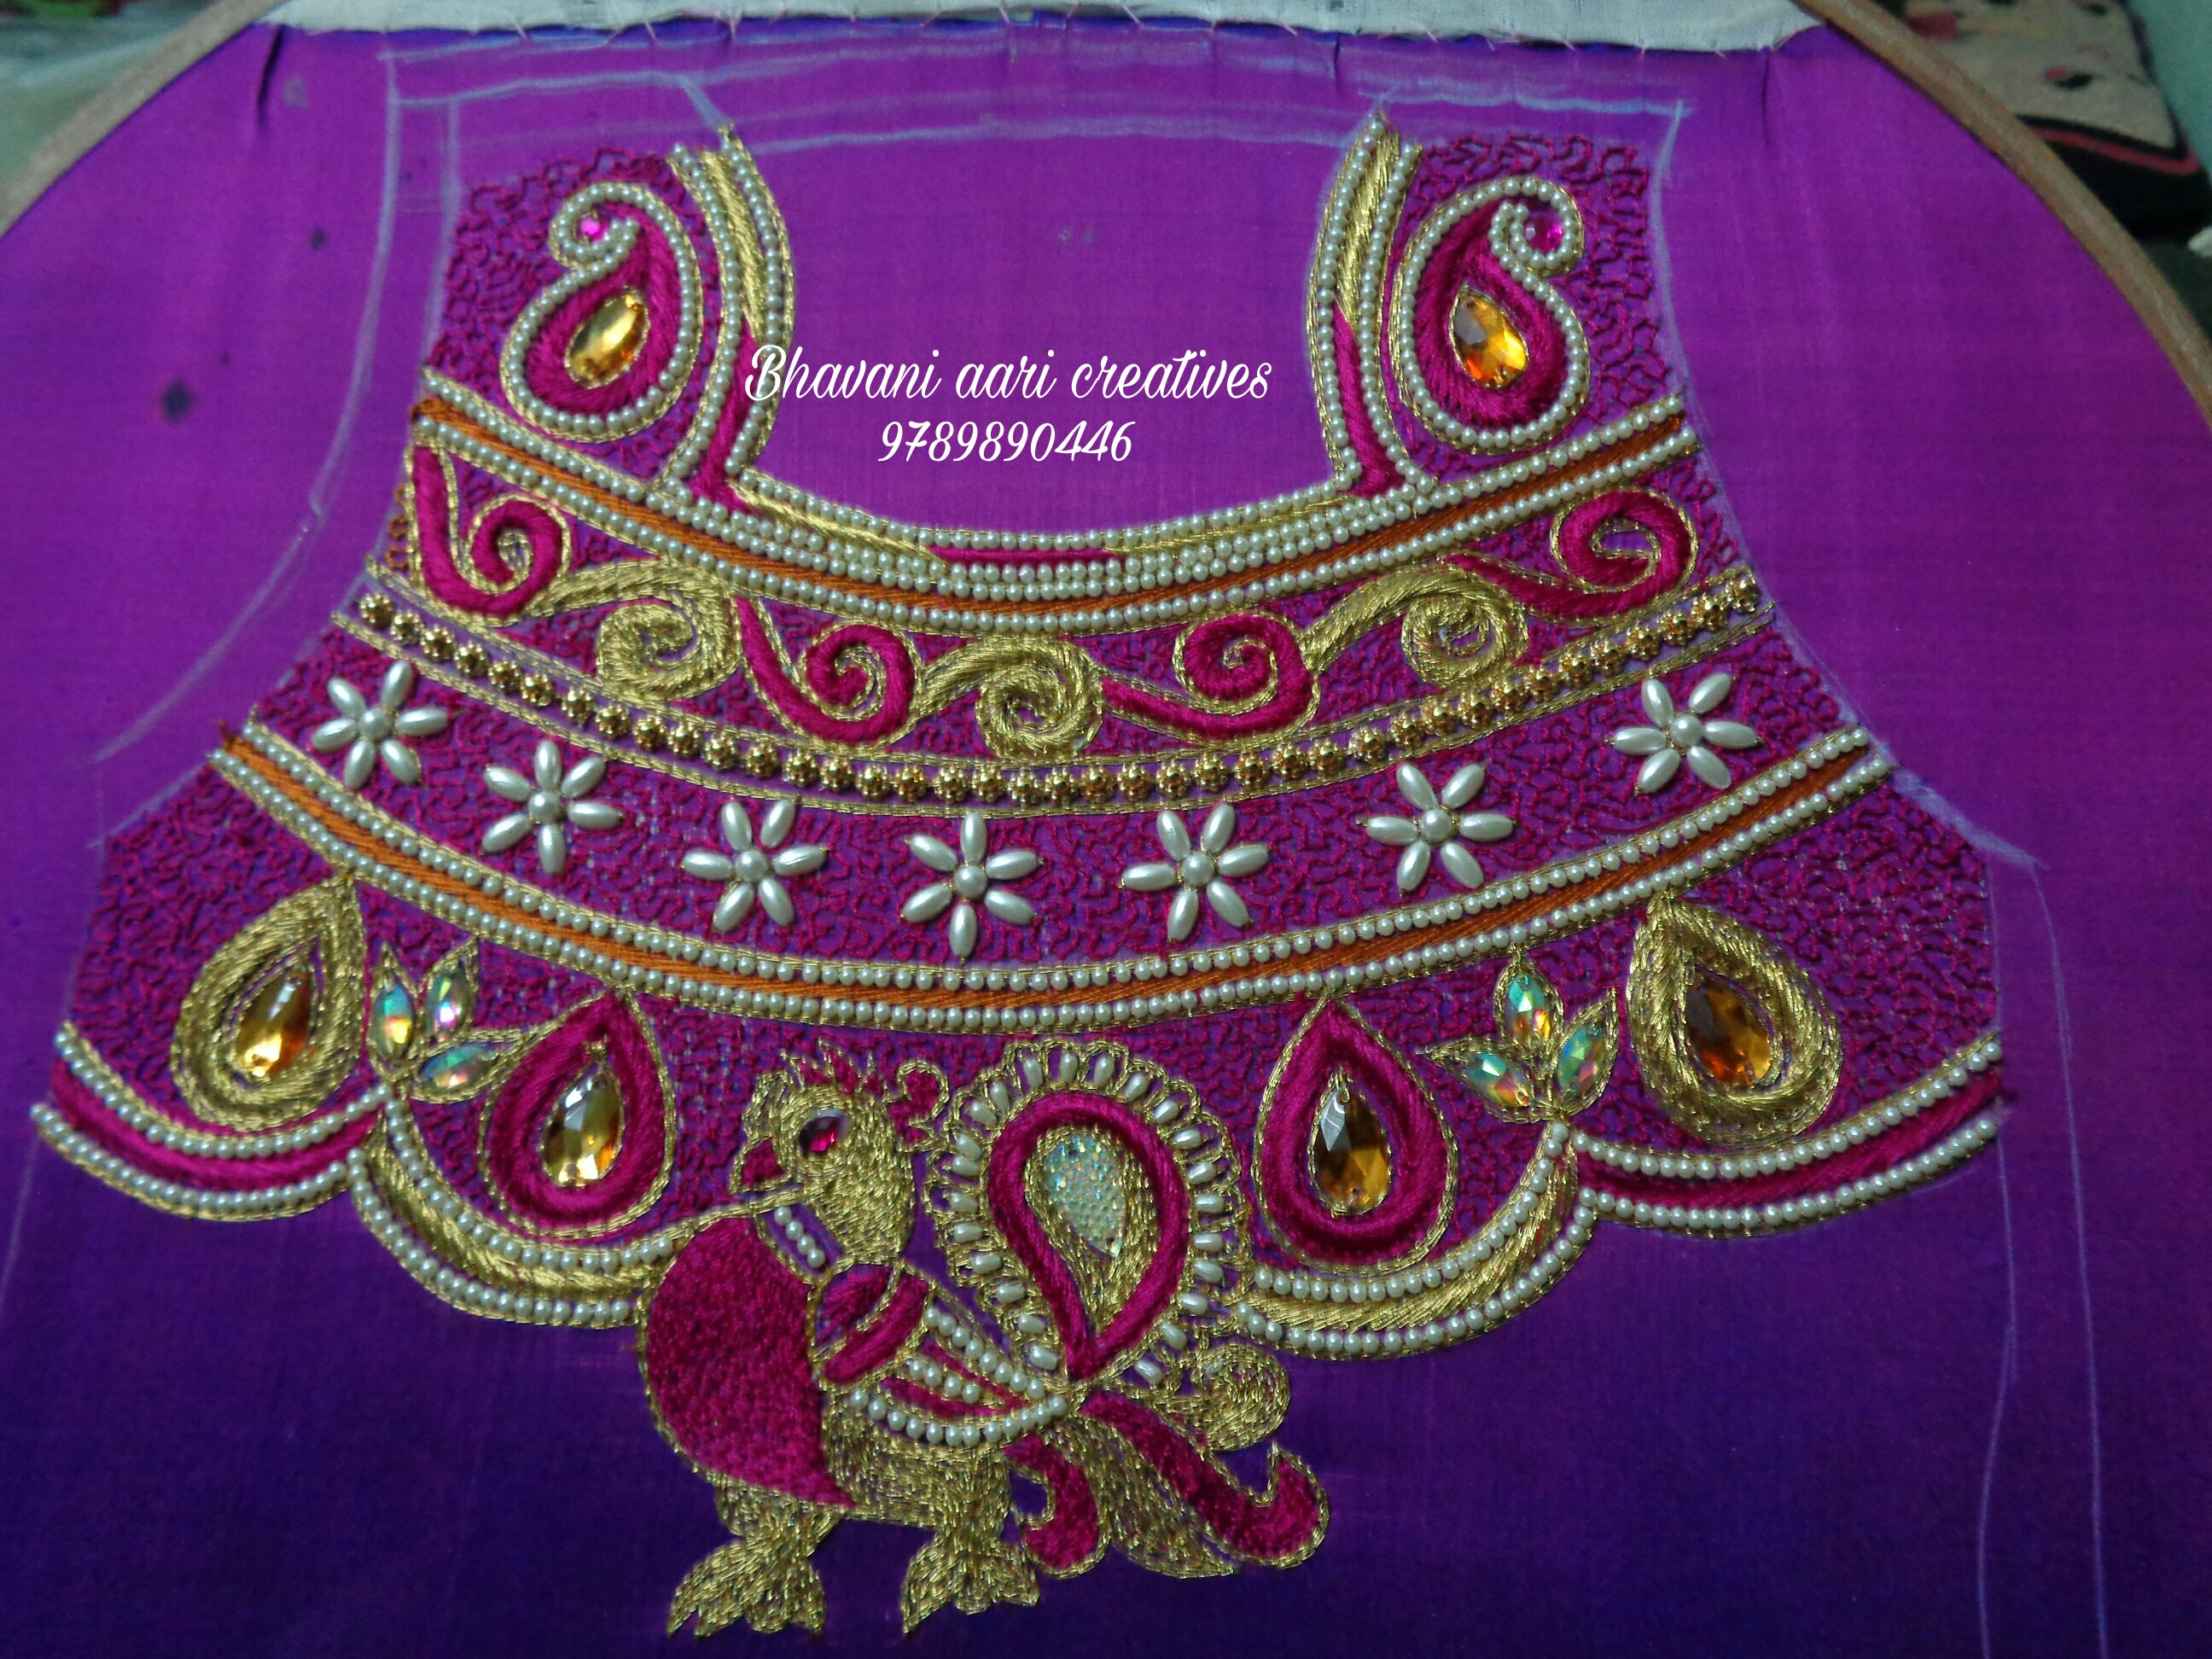 Embroidery Job Work In Chennai | Ausbeta.com